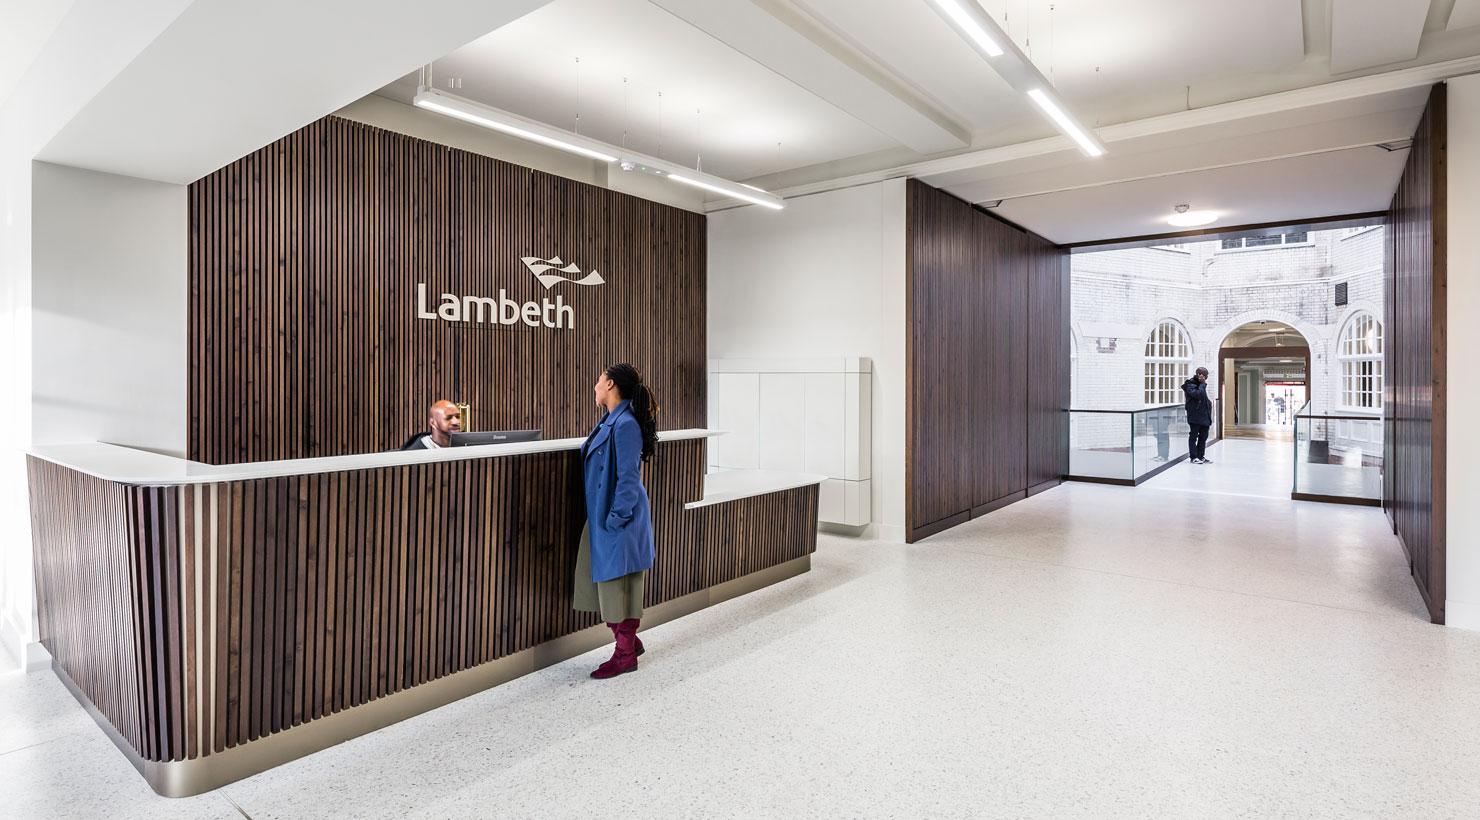 Lambeth-civic-08